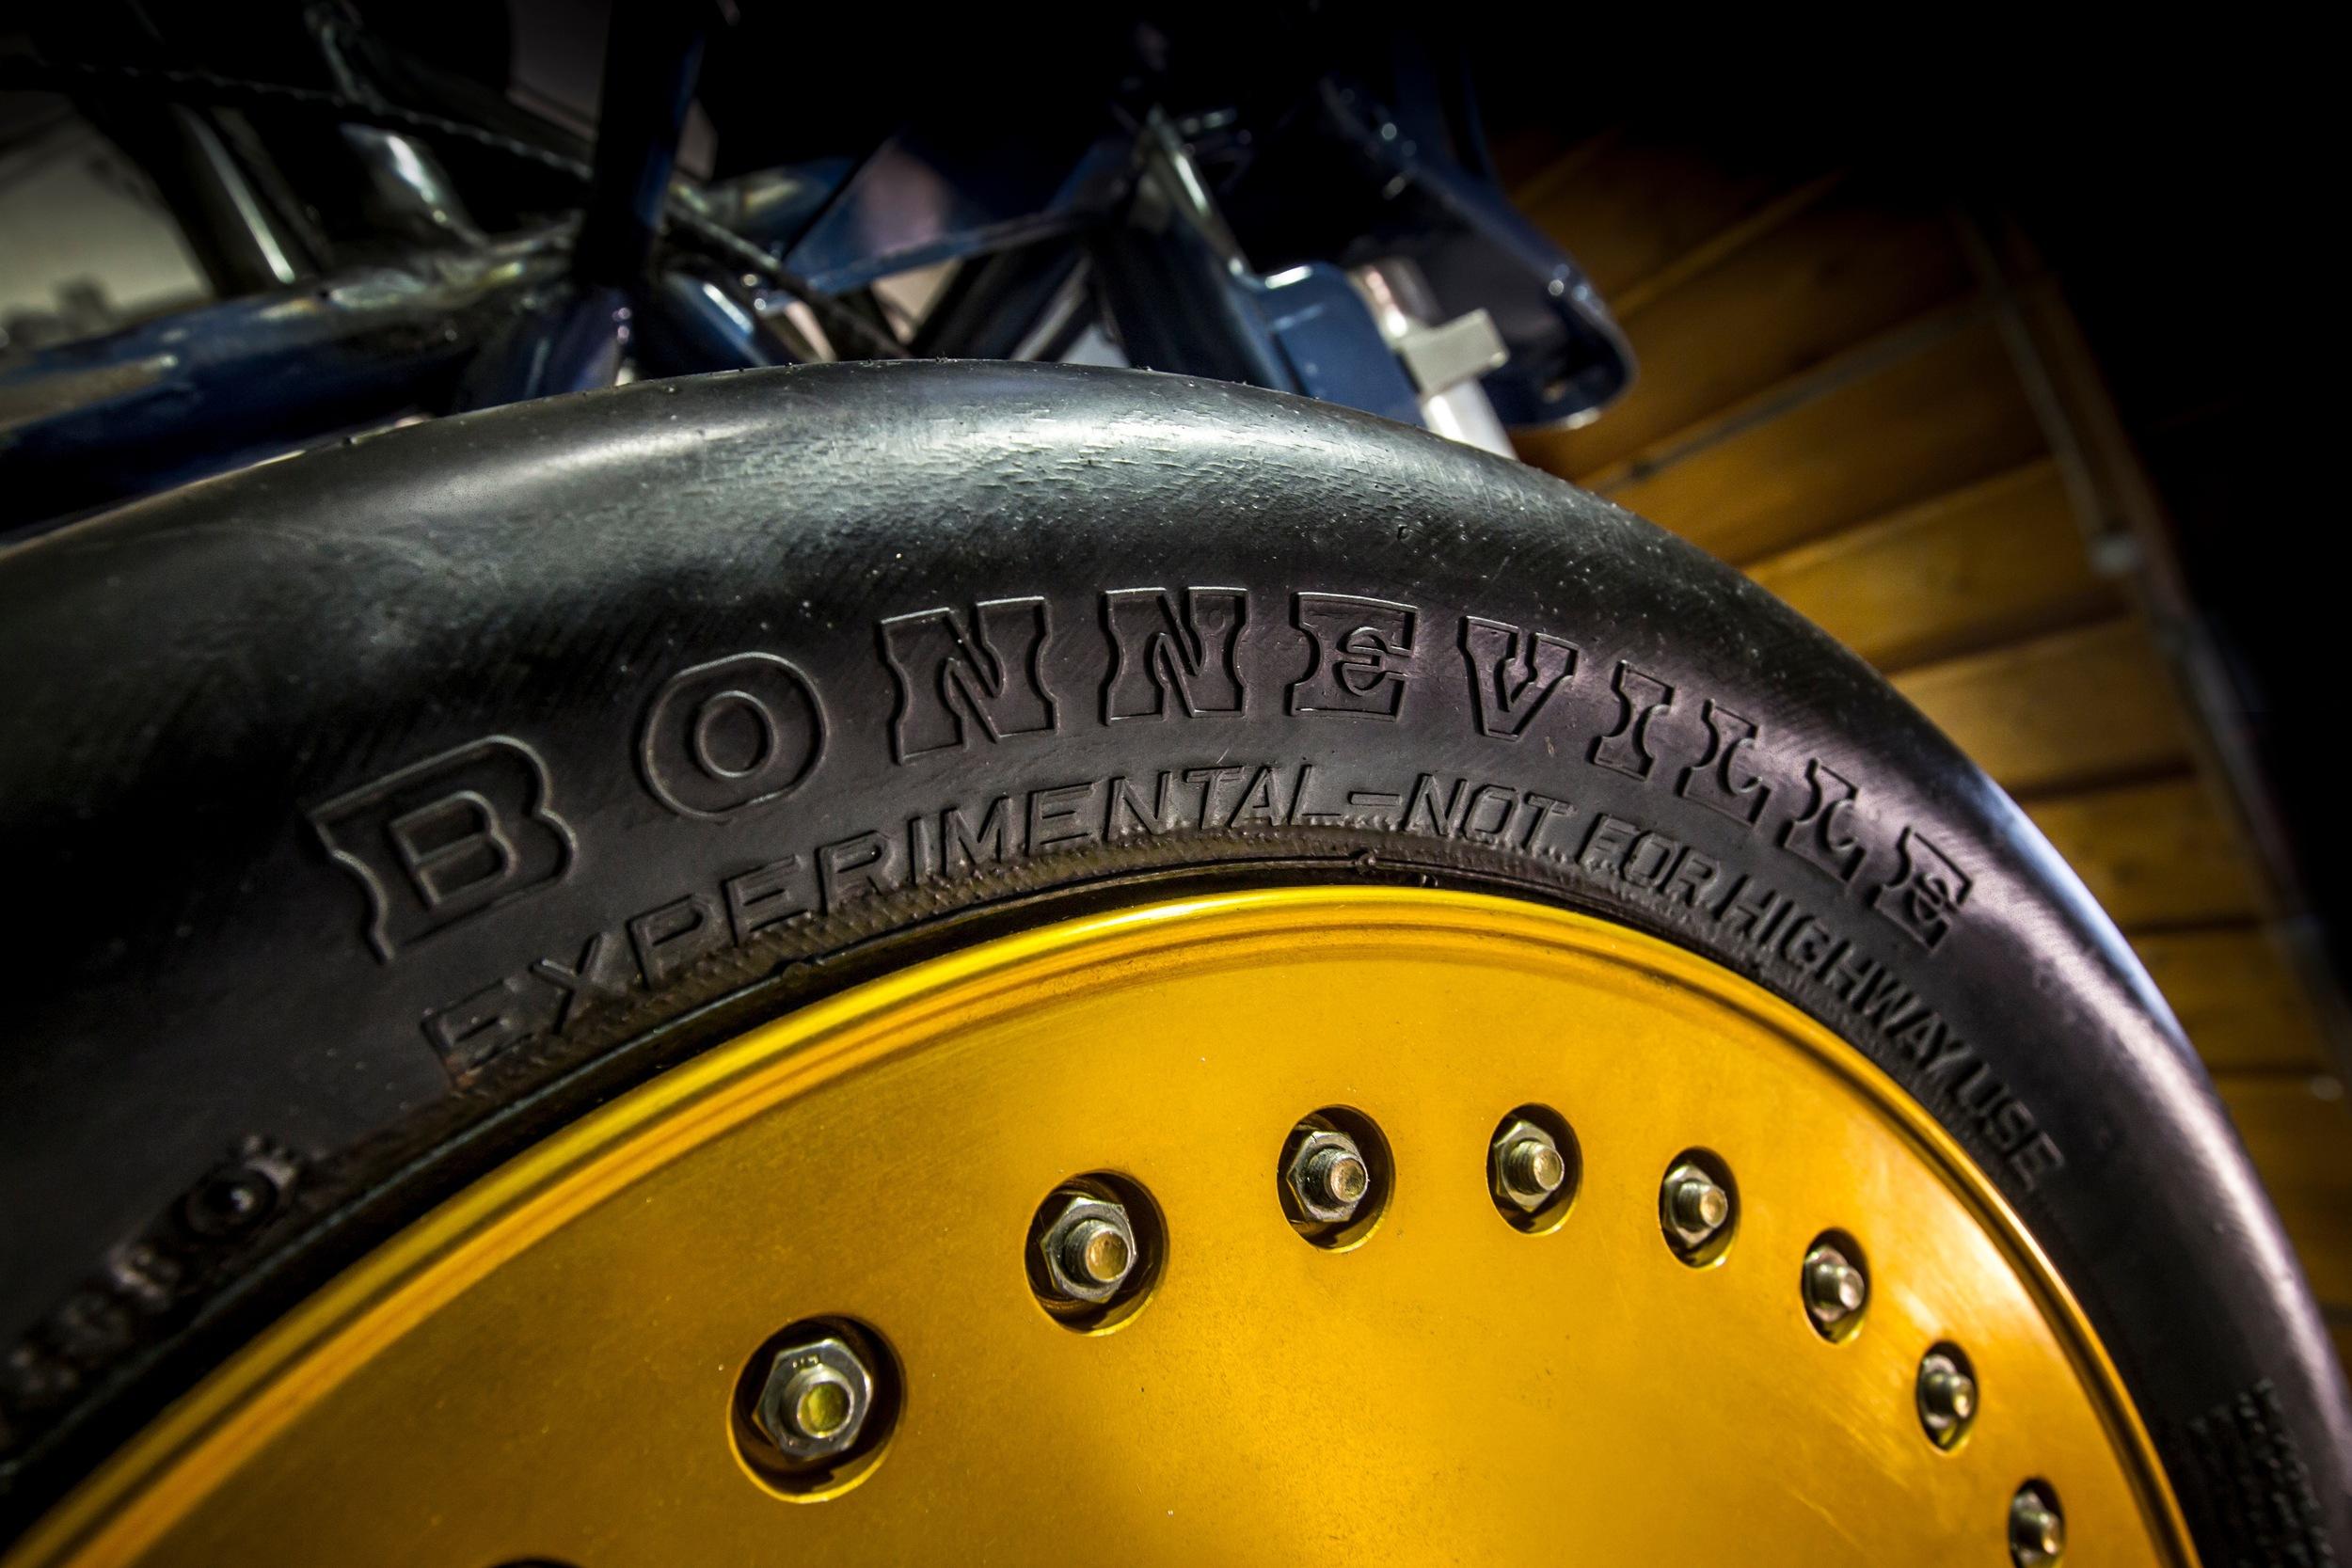 bonneville tire-thompson lsr - image by holly martin.jpg